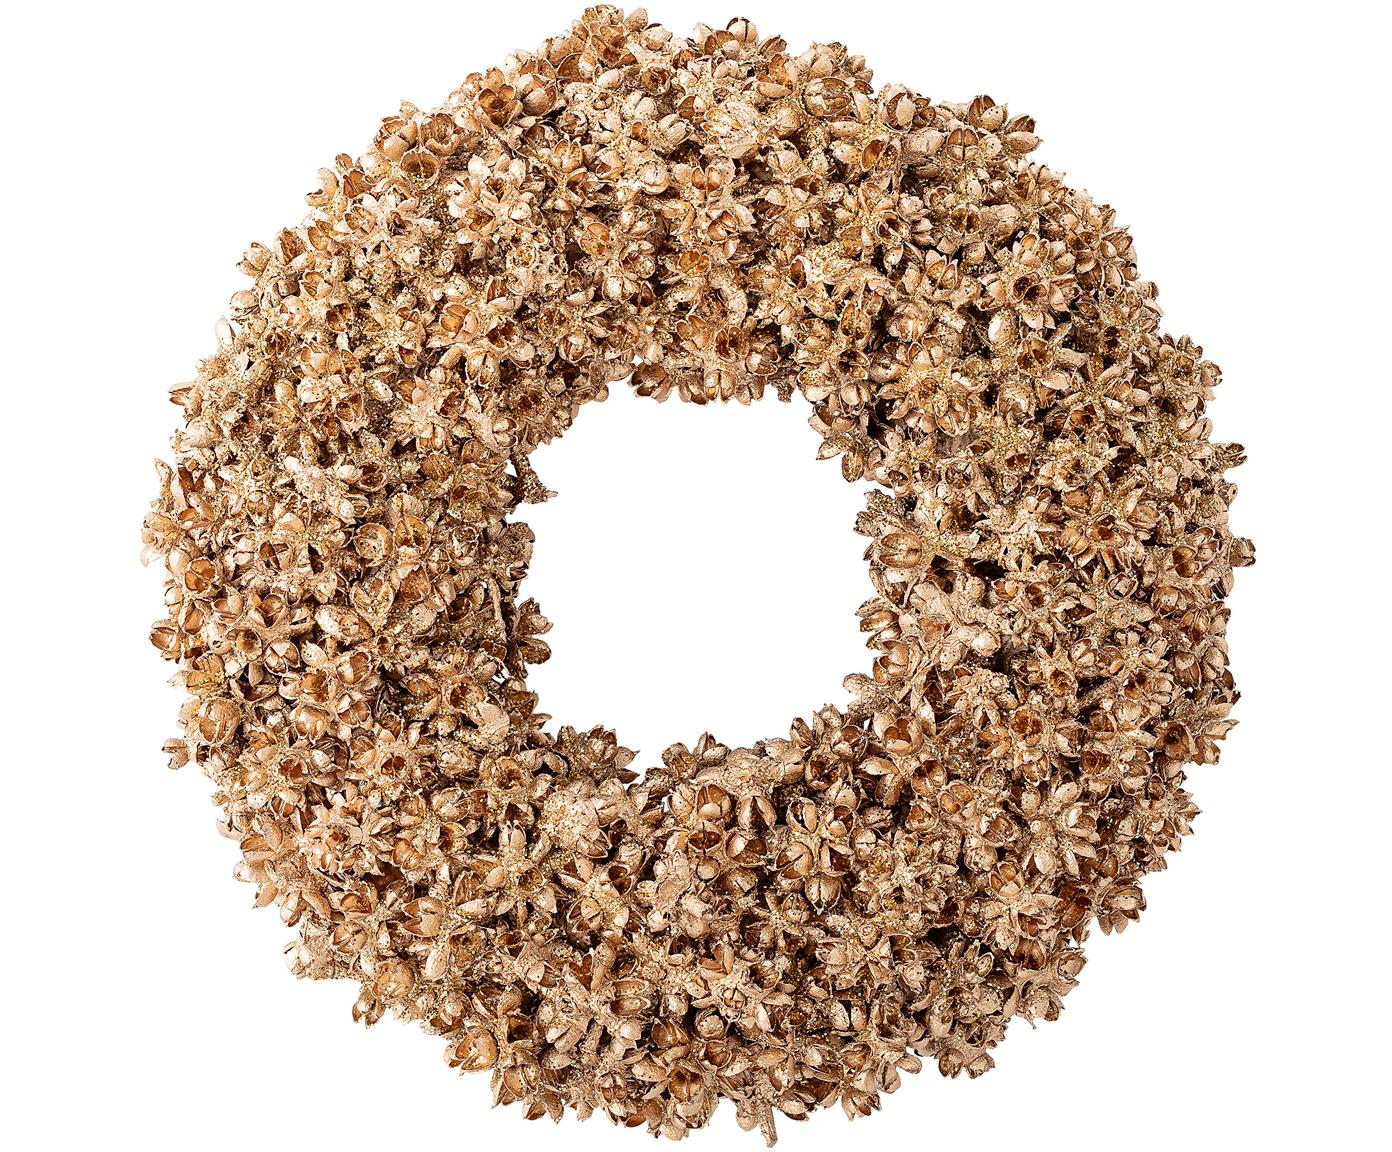 Corona decorativa Pinecone, Madera recubierta, espuma, Dorado, Ø 20 x Al 6 cm